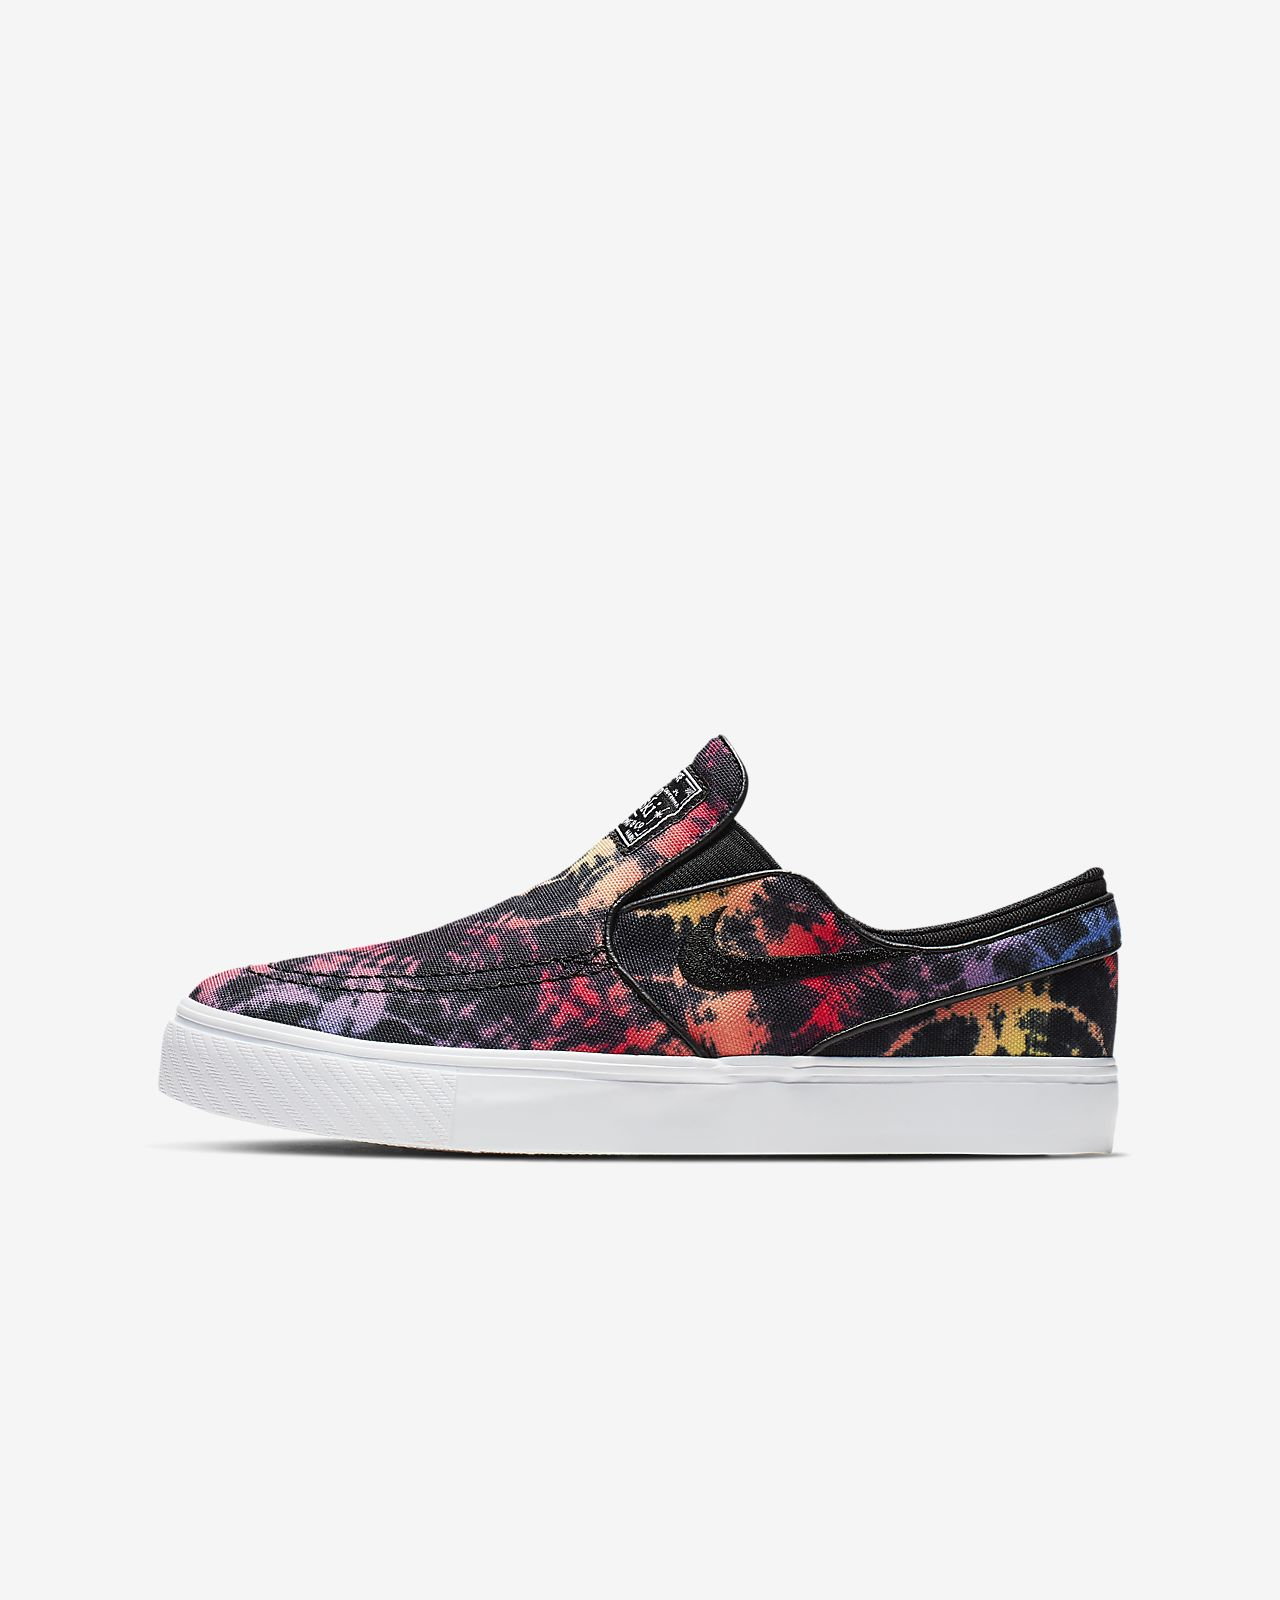 Nike SB Stefan Janoski Canvas Slip Tie-Dye Older Kids' Skate Shoe